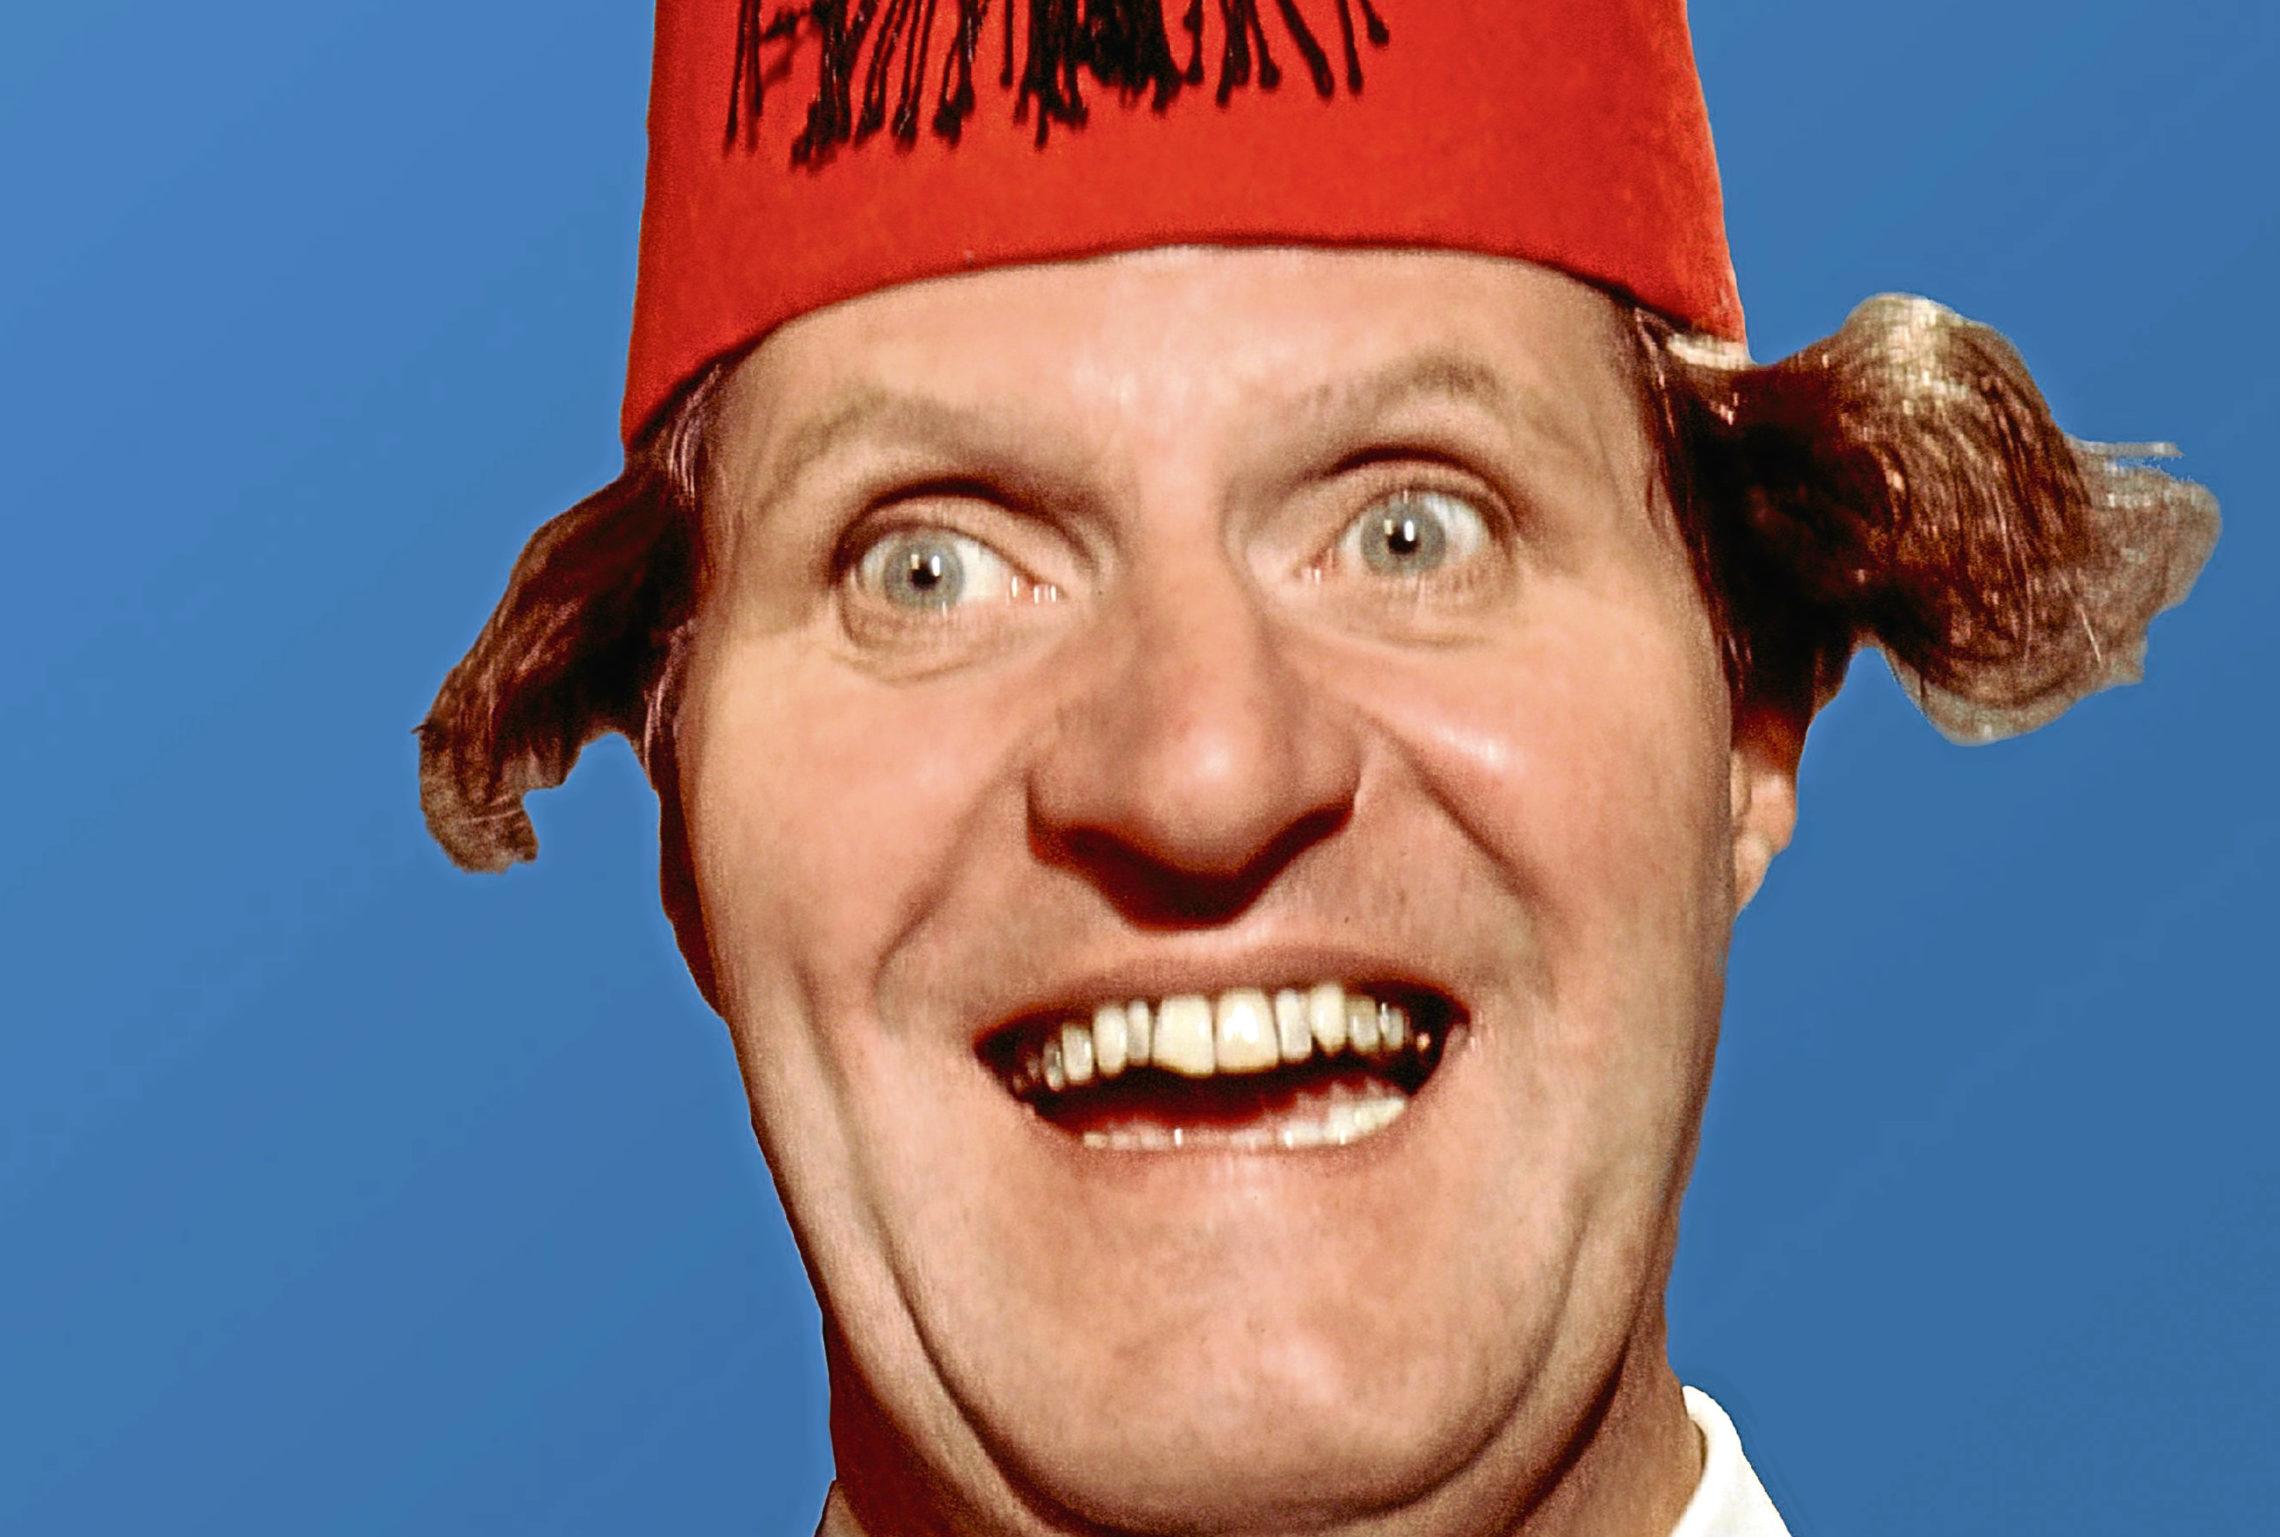 Comedian Tommy Cooper